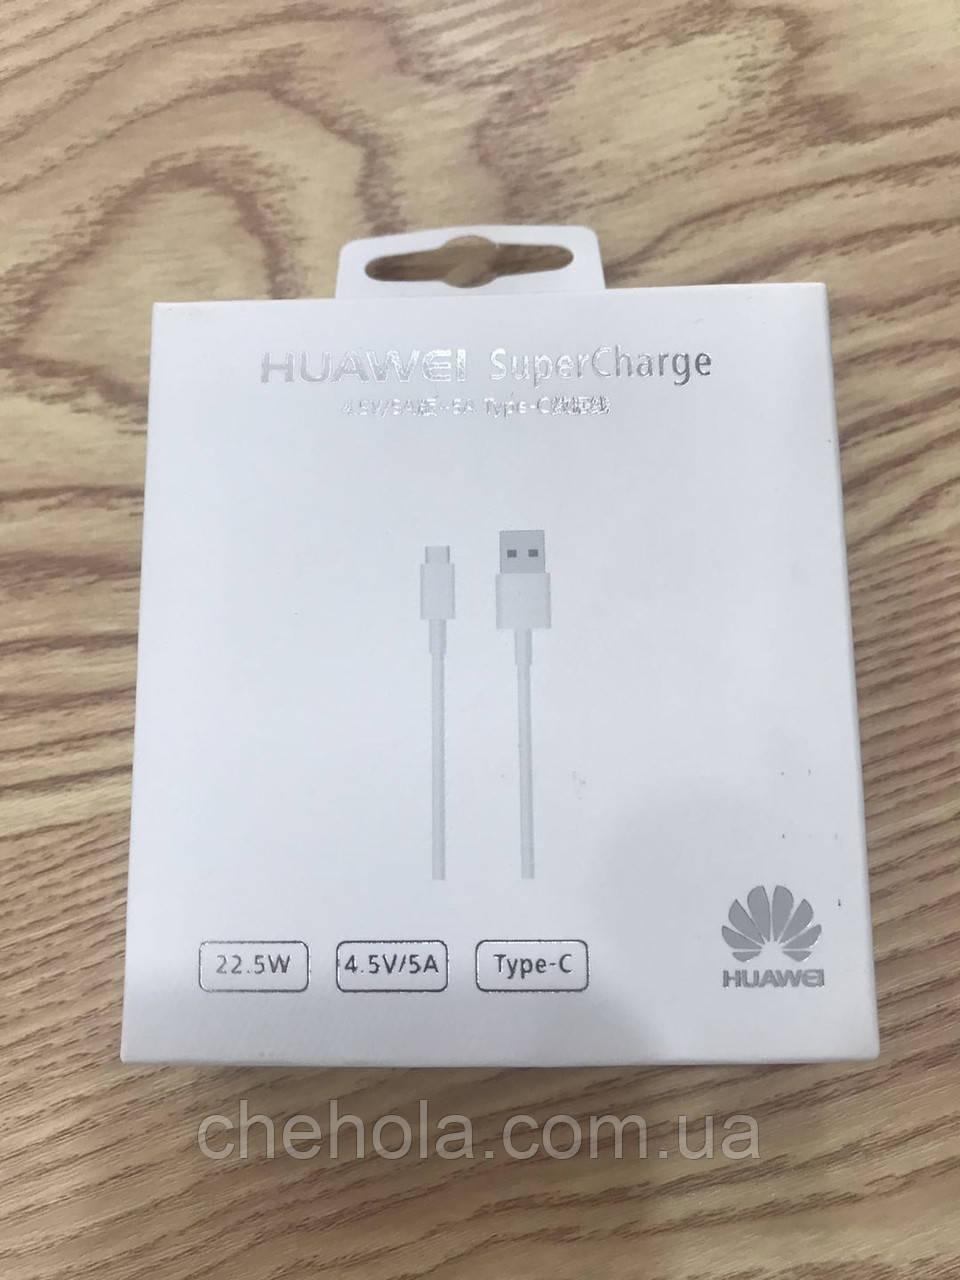 Кабель быстрая зарядка Huawei Оригинальный Type C  Supercable 5A Quick Charge